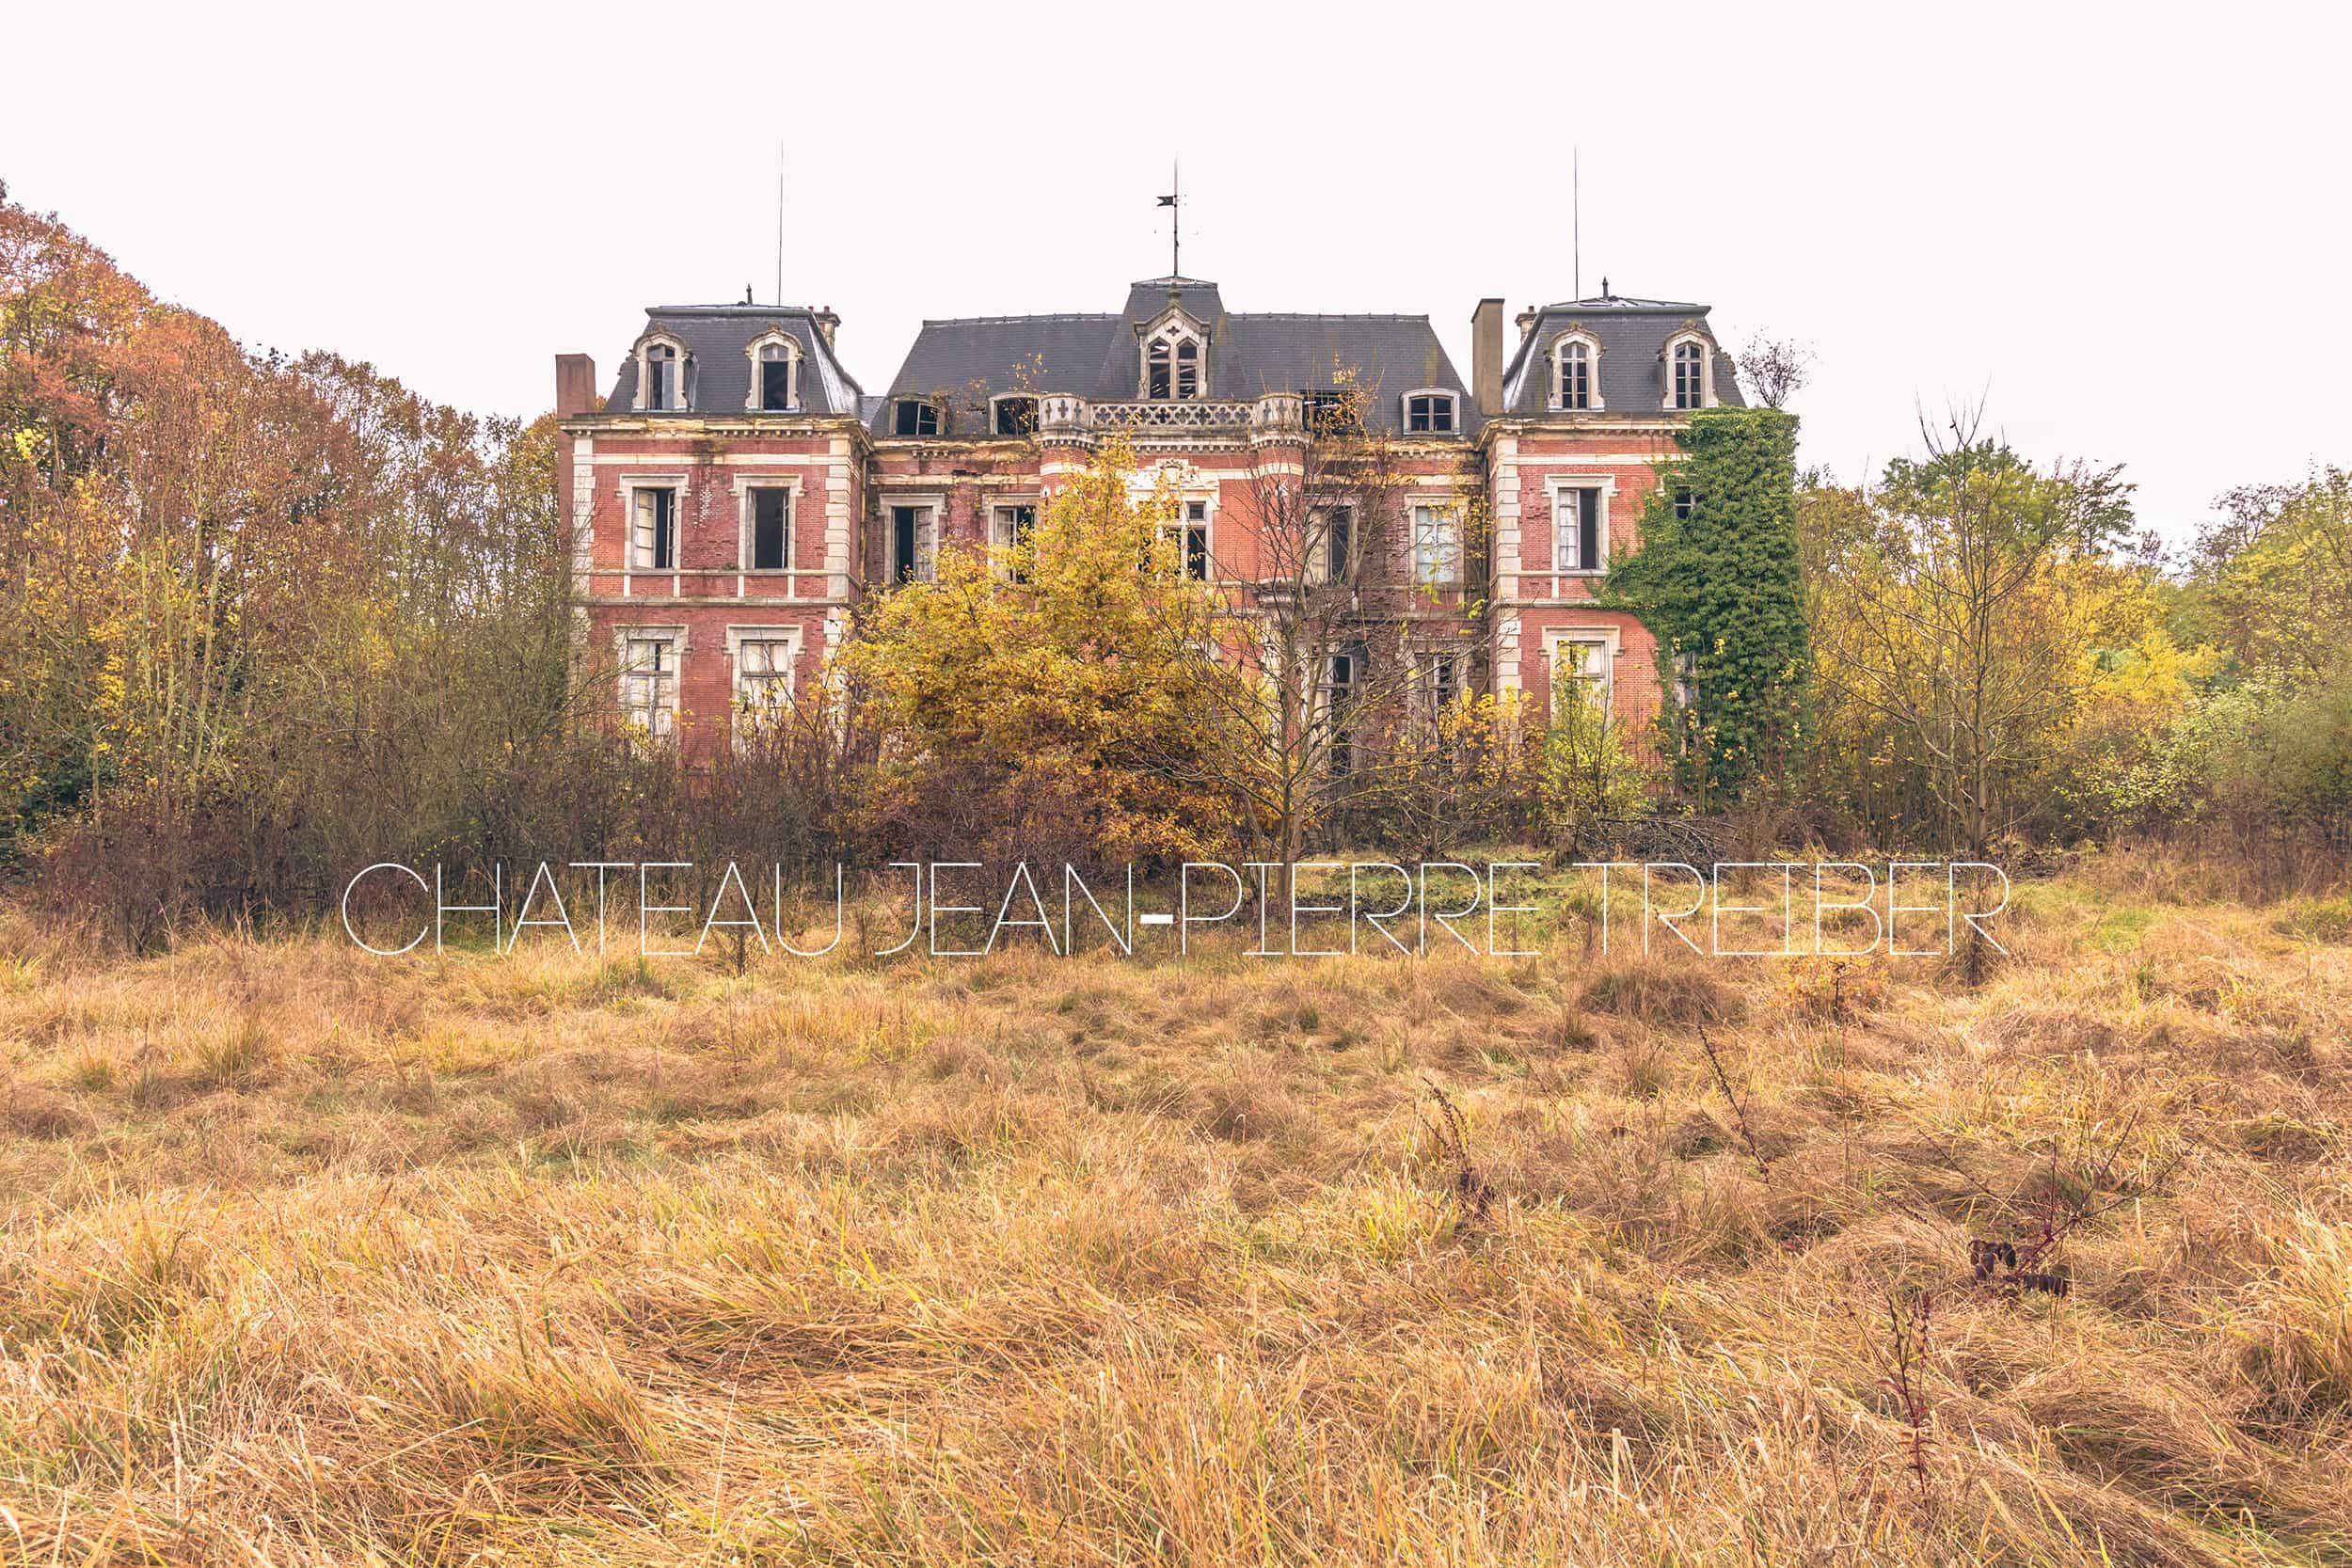 chateau-jean-pierre-treiber-0